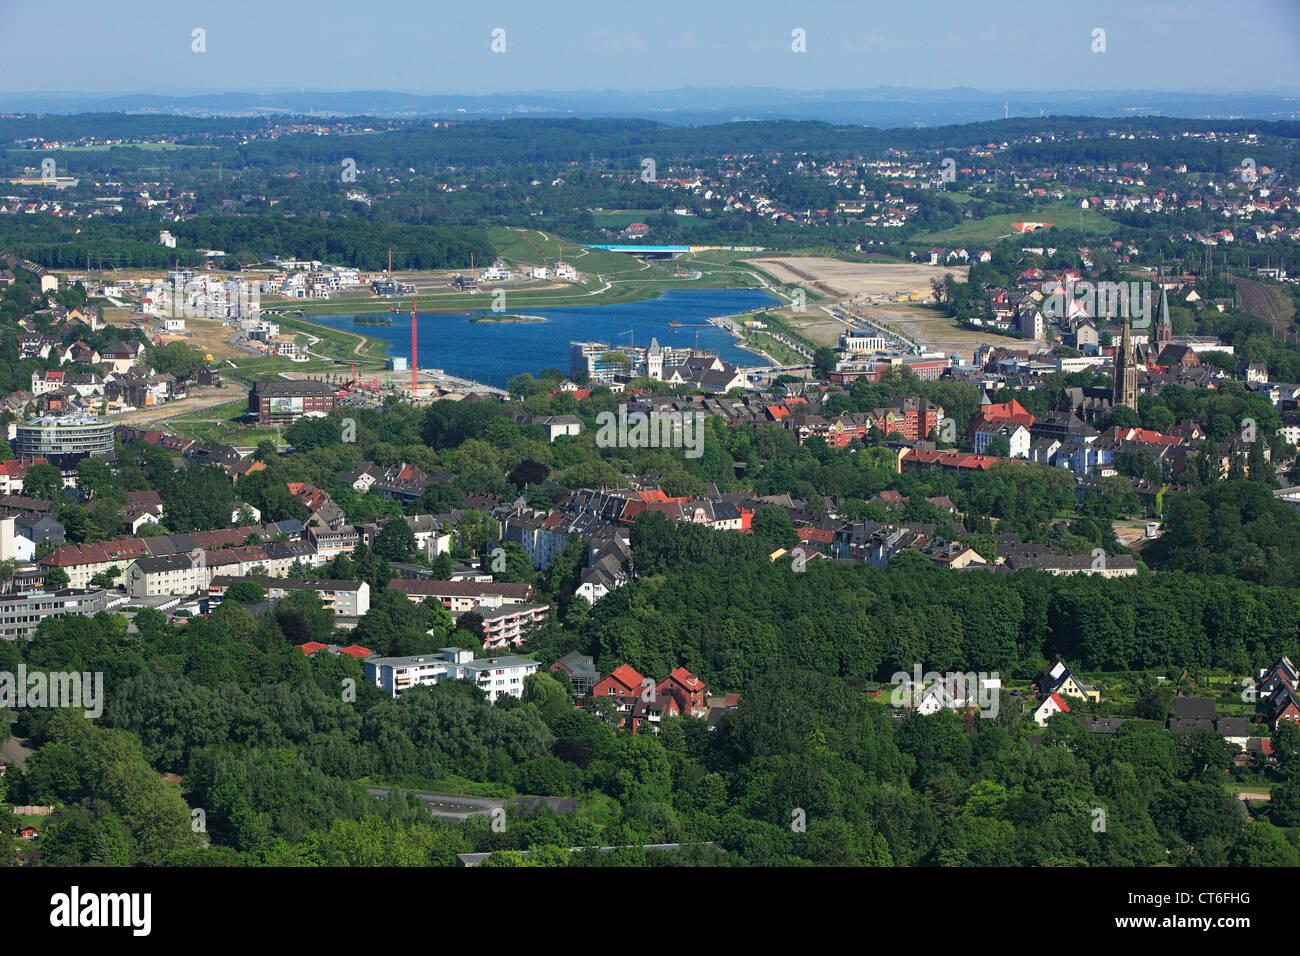 D-Dortmund, Ruhr area, Westphalia, North Rhine-Westphalia, NRW, D-Dortmund-Hoerde, city view, aerial view, Phoenix Stock Photo